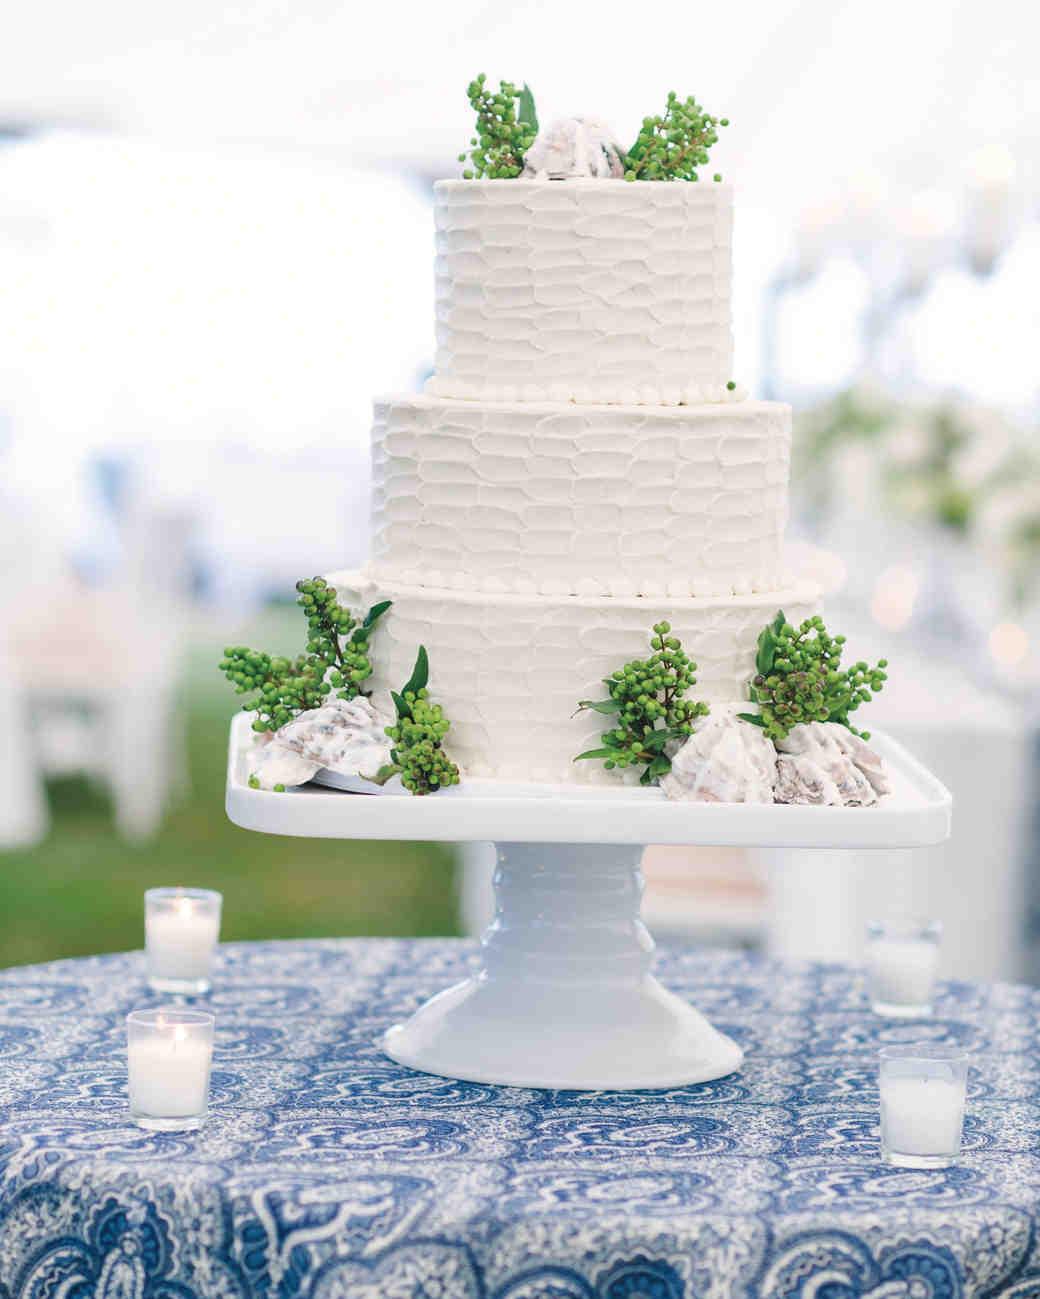 olivia-tyler-wedding-newport-sub-65-s111822.jpg